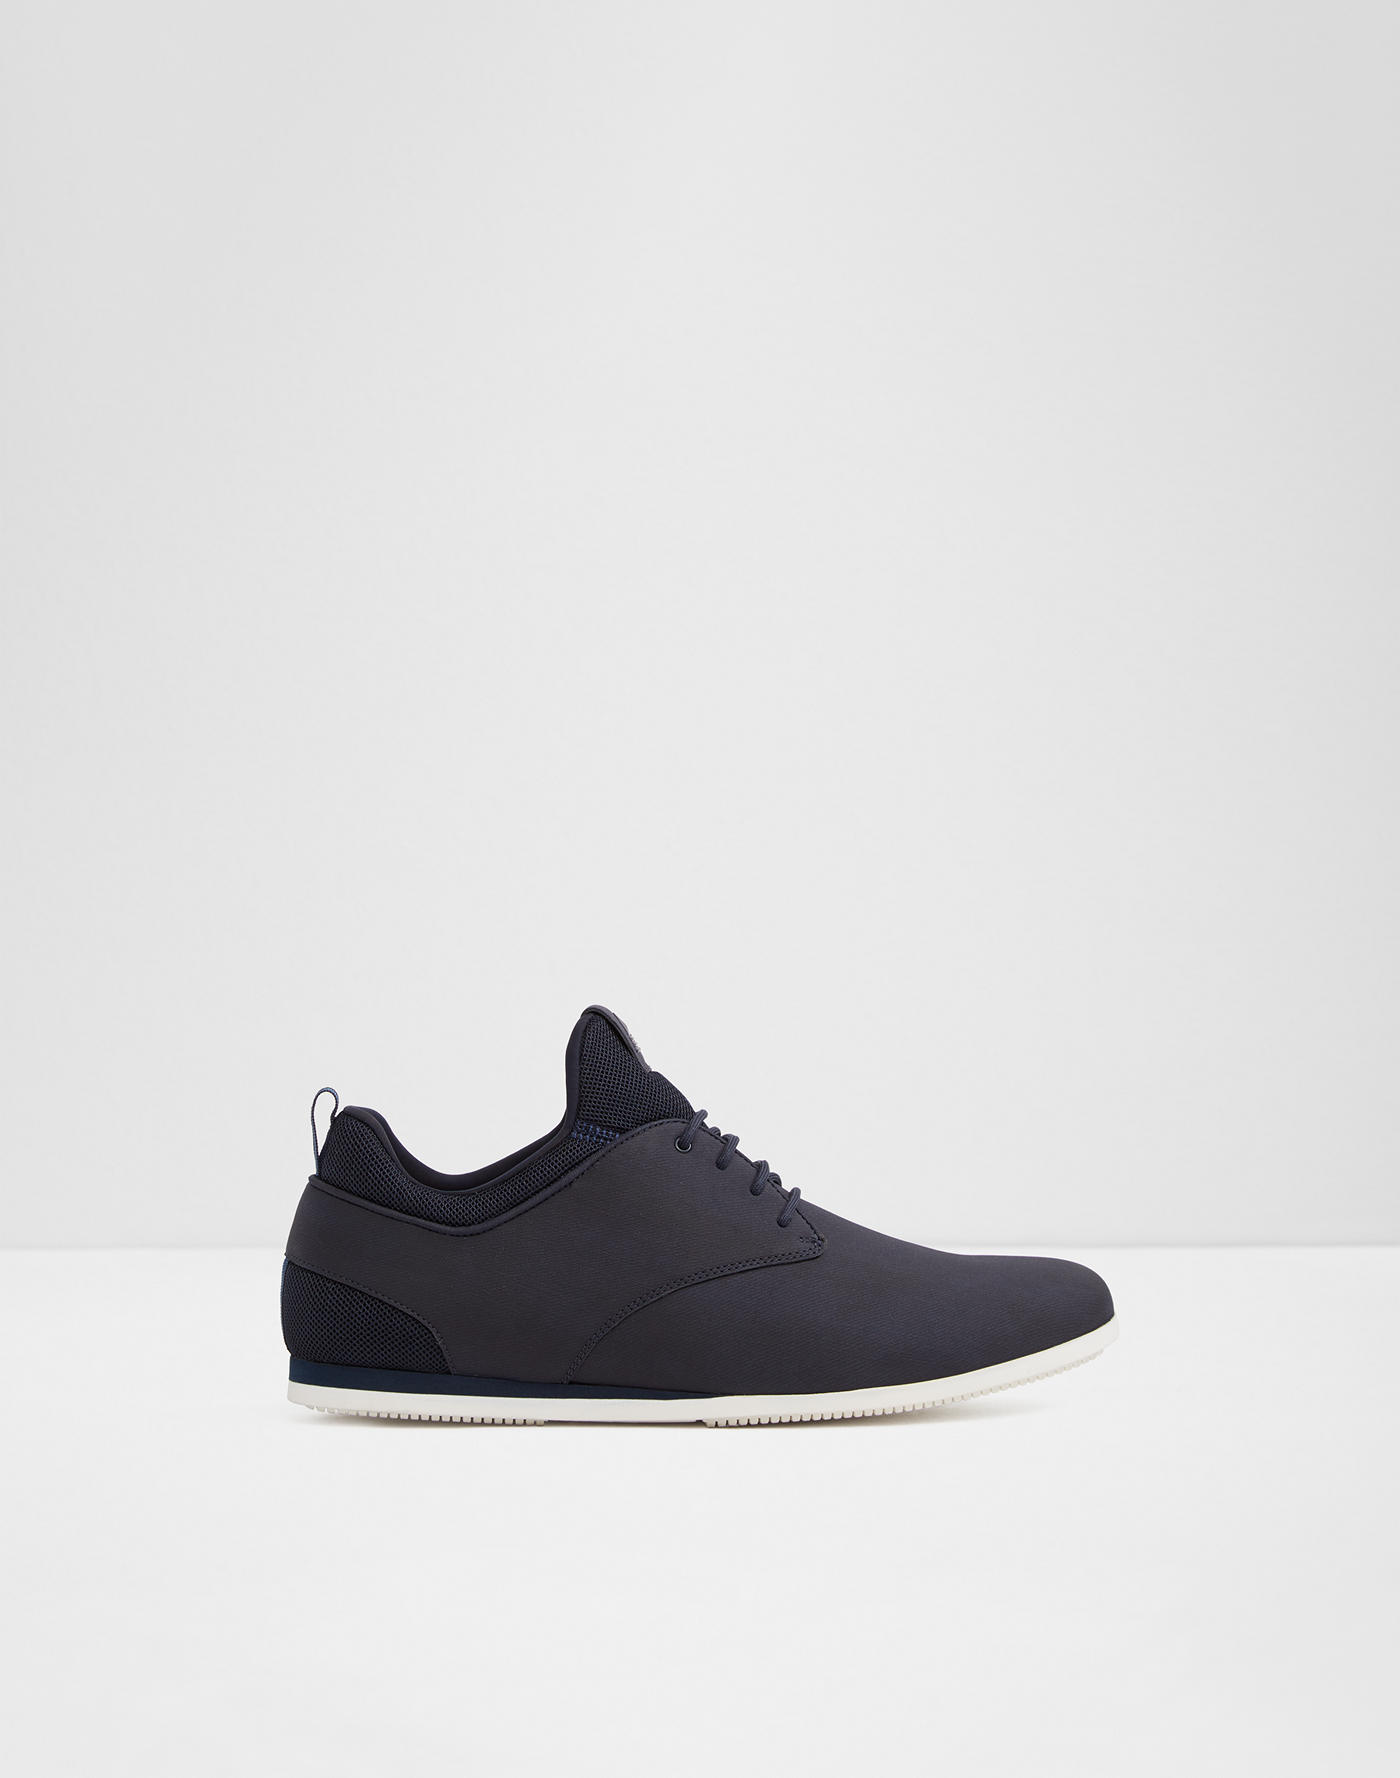 477f988402 Sneakers | Aldoshoes.com US